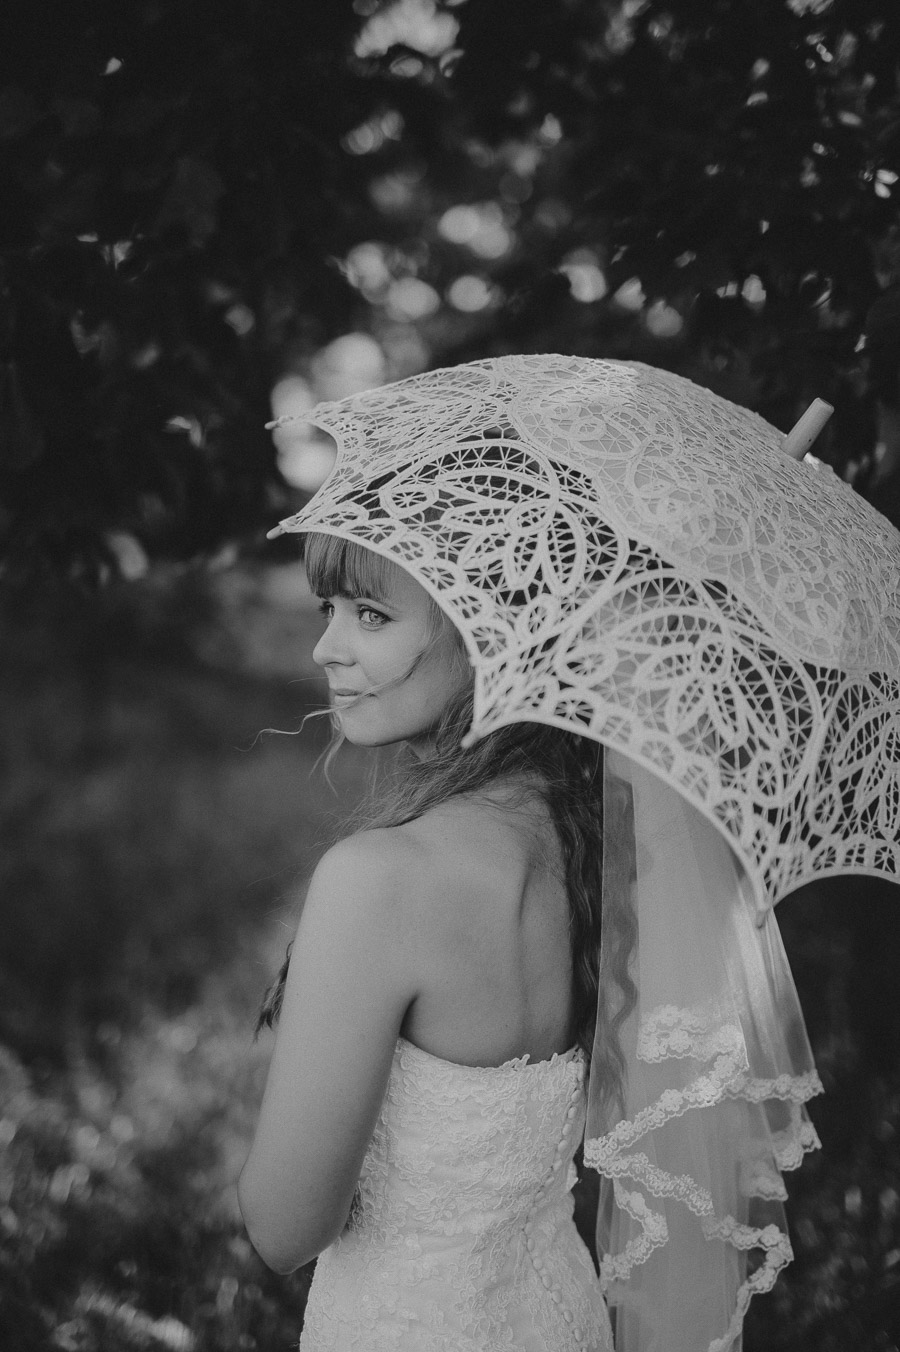 Best_wedding_photos_moments_2014_mait_juriado_M&J-Studios-139